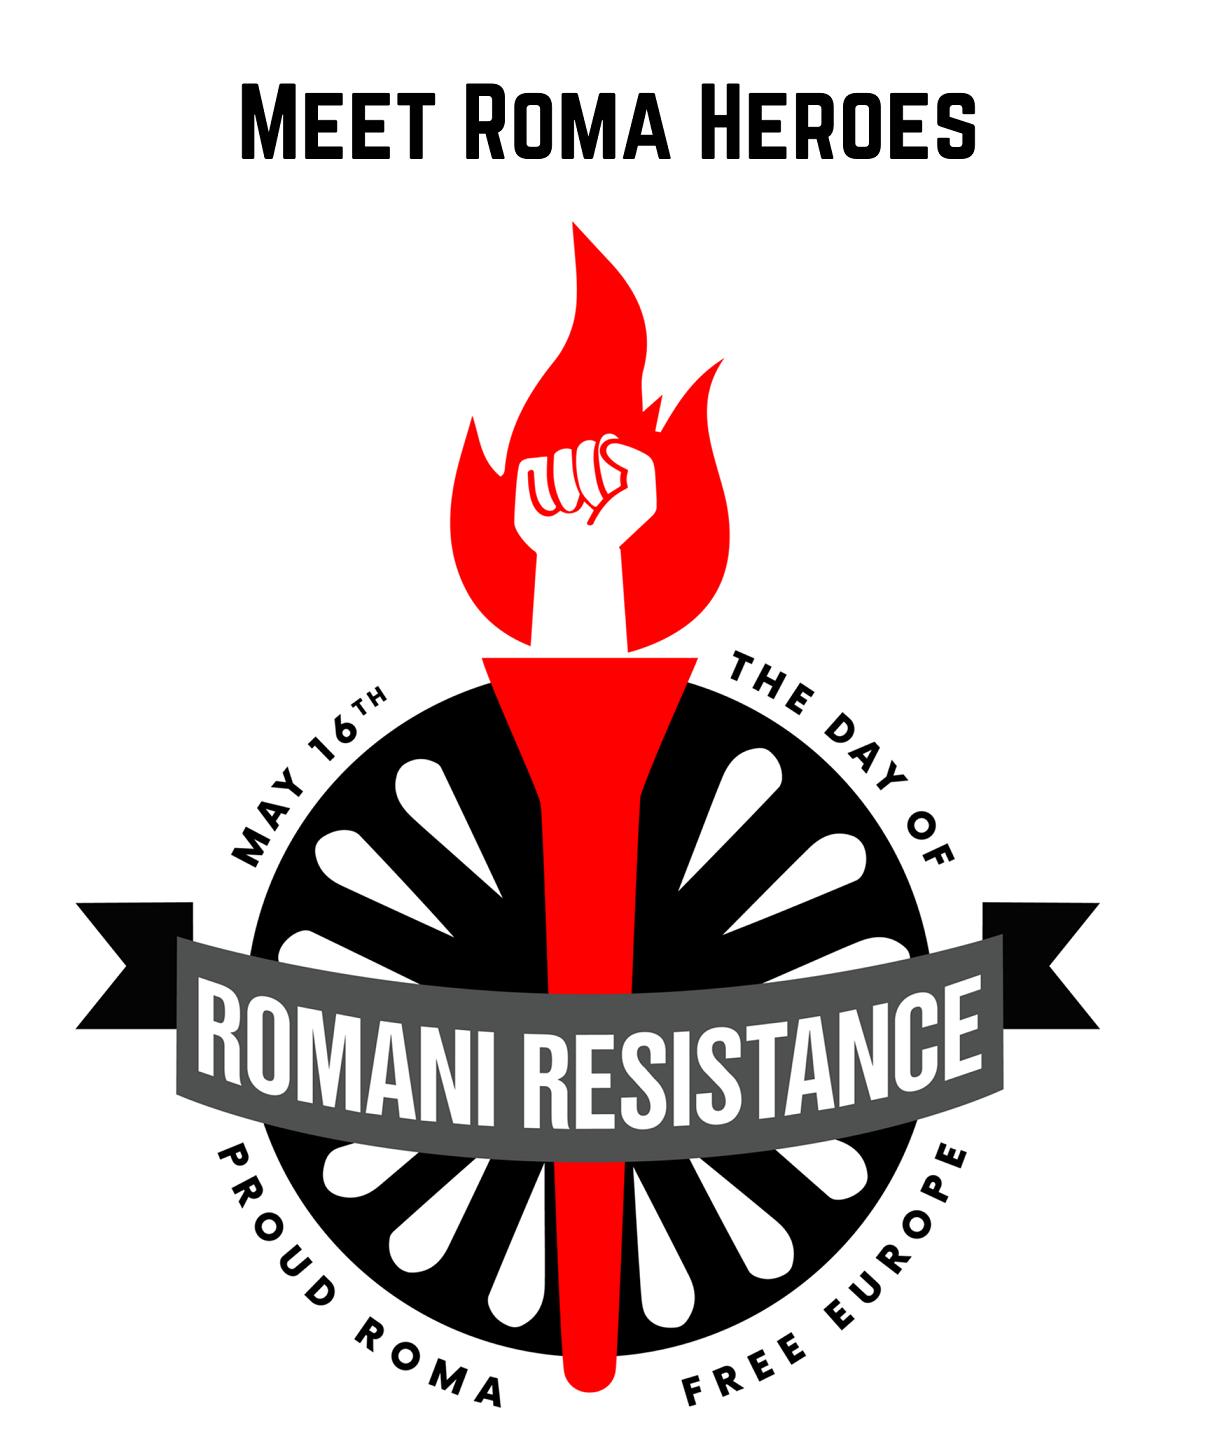 Meet Roma Heroes - Romani resistance